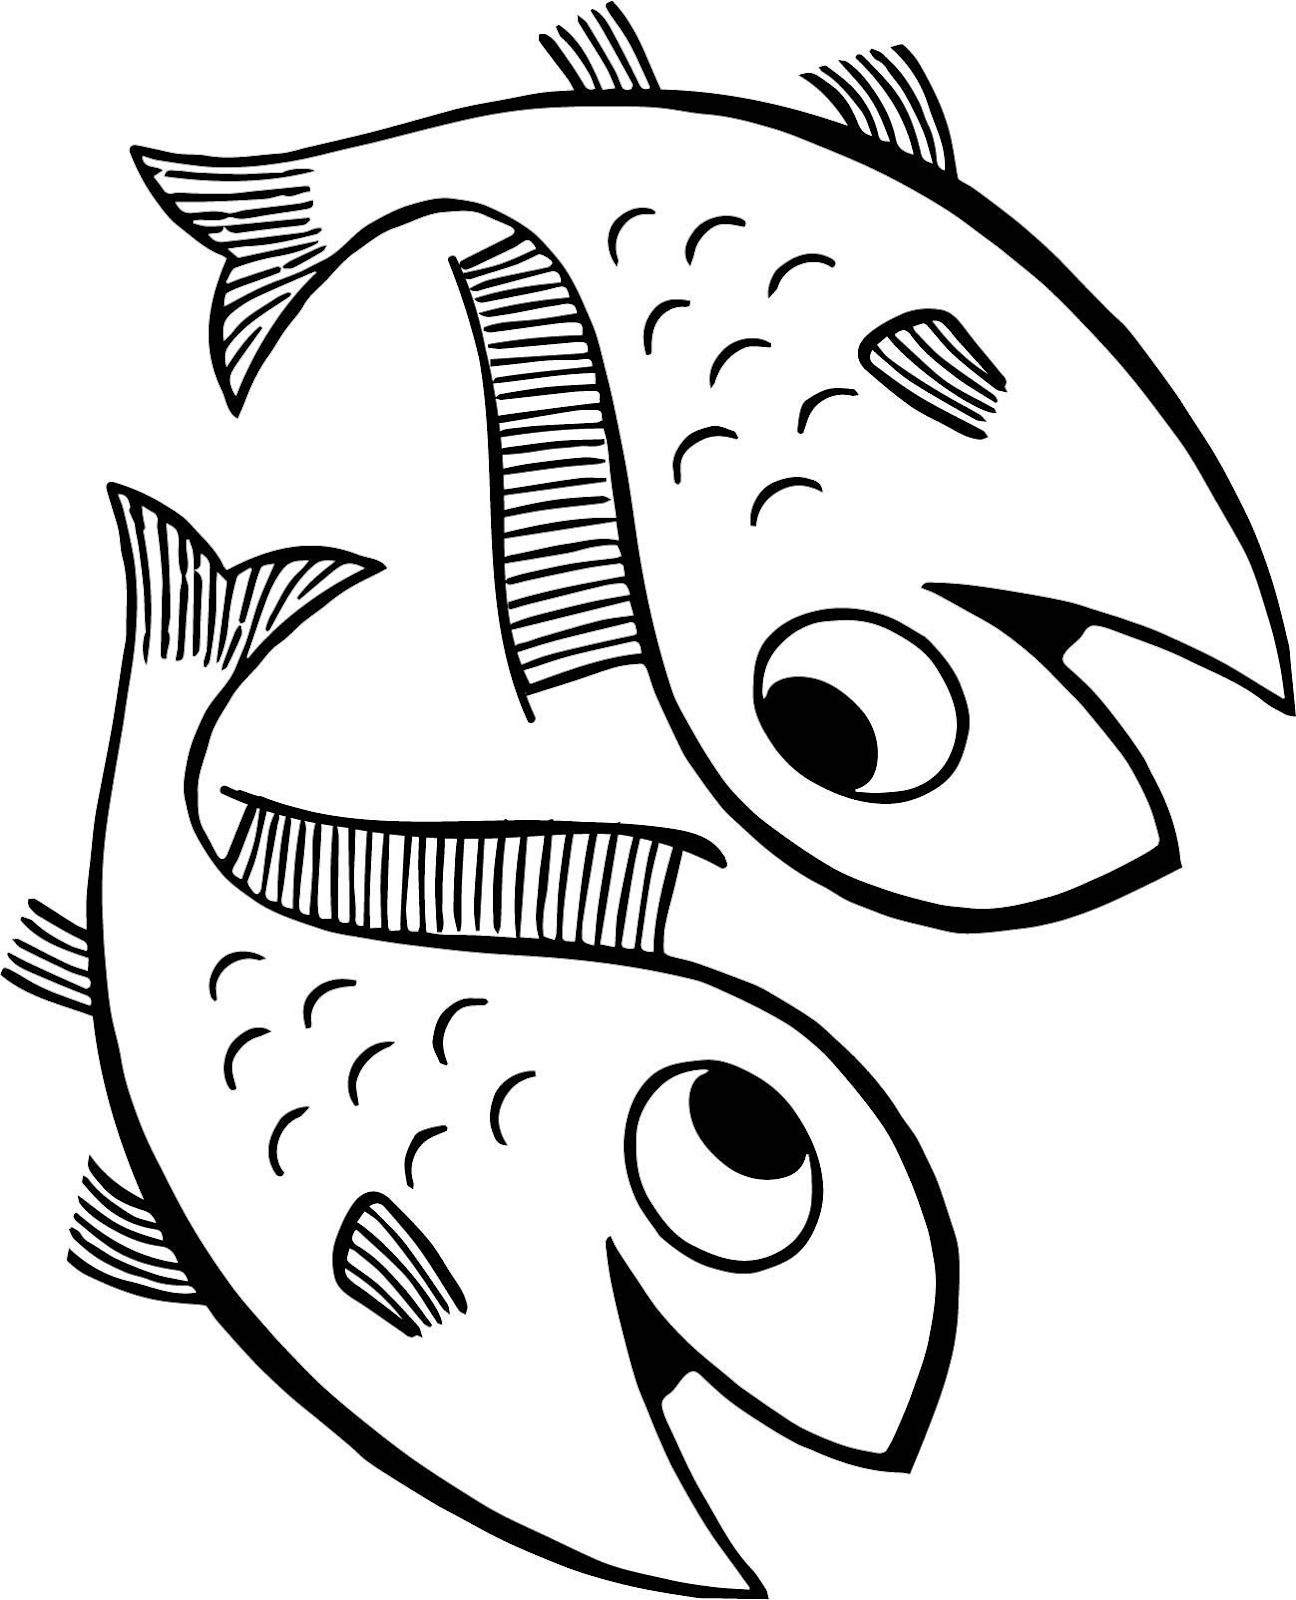 Malvorlage Angler Malen